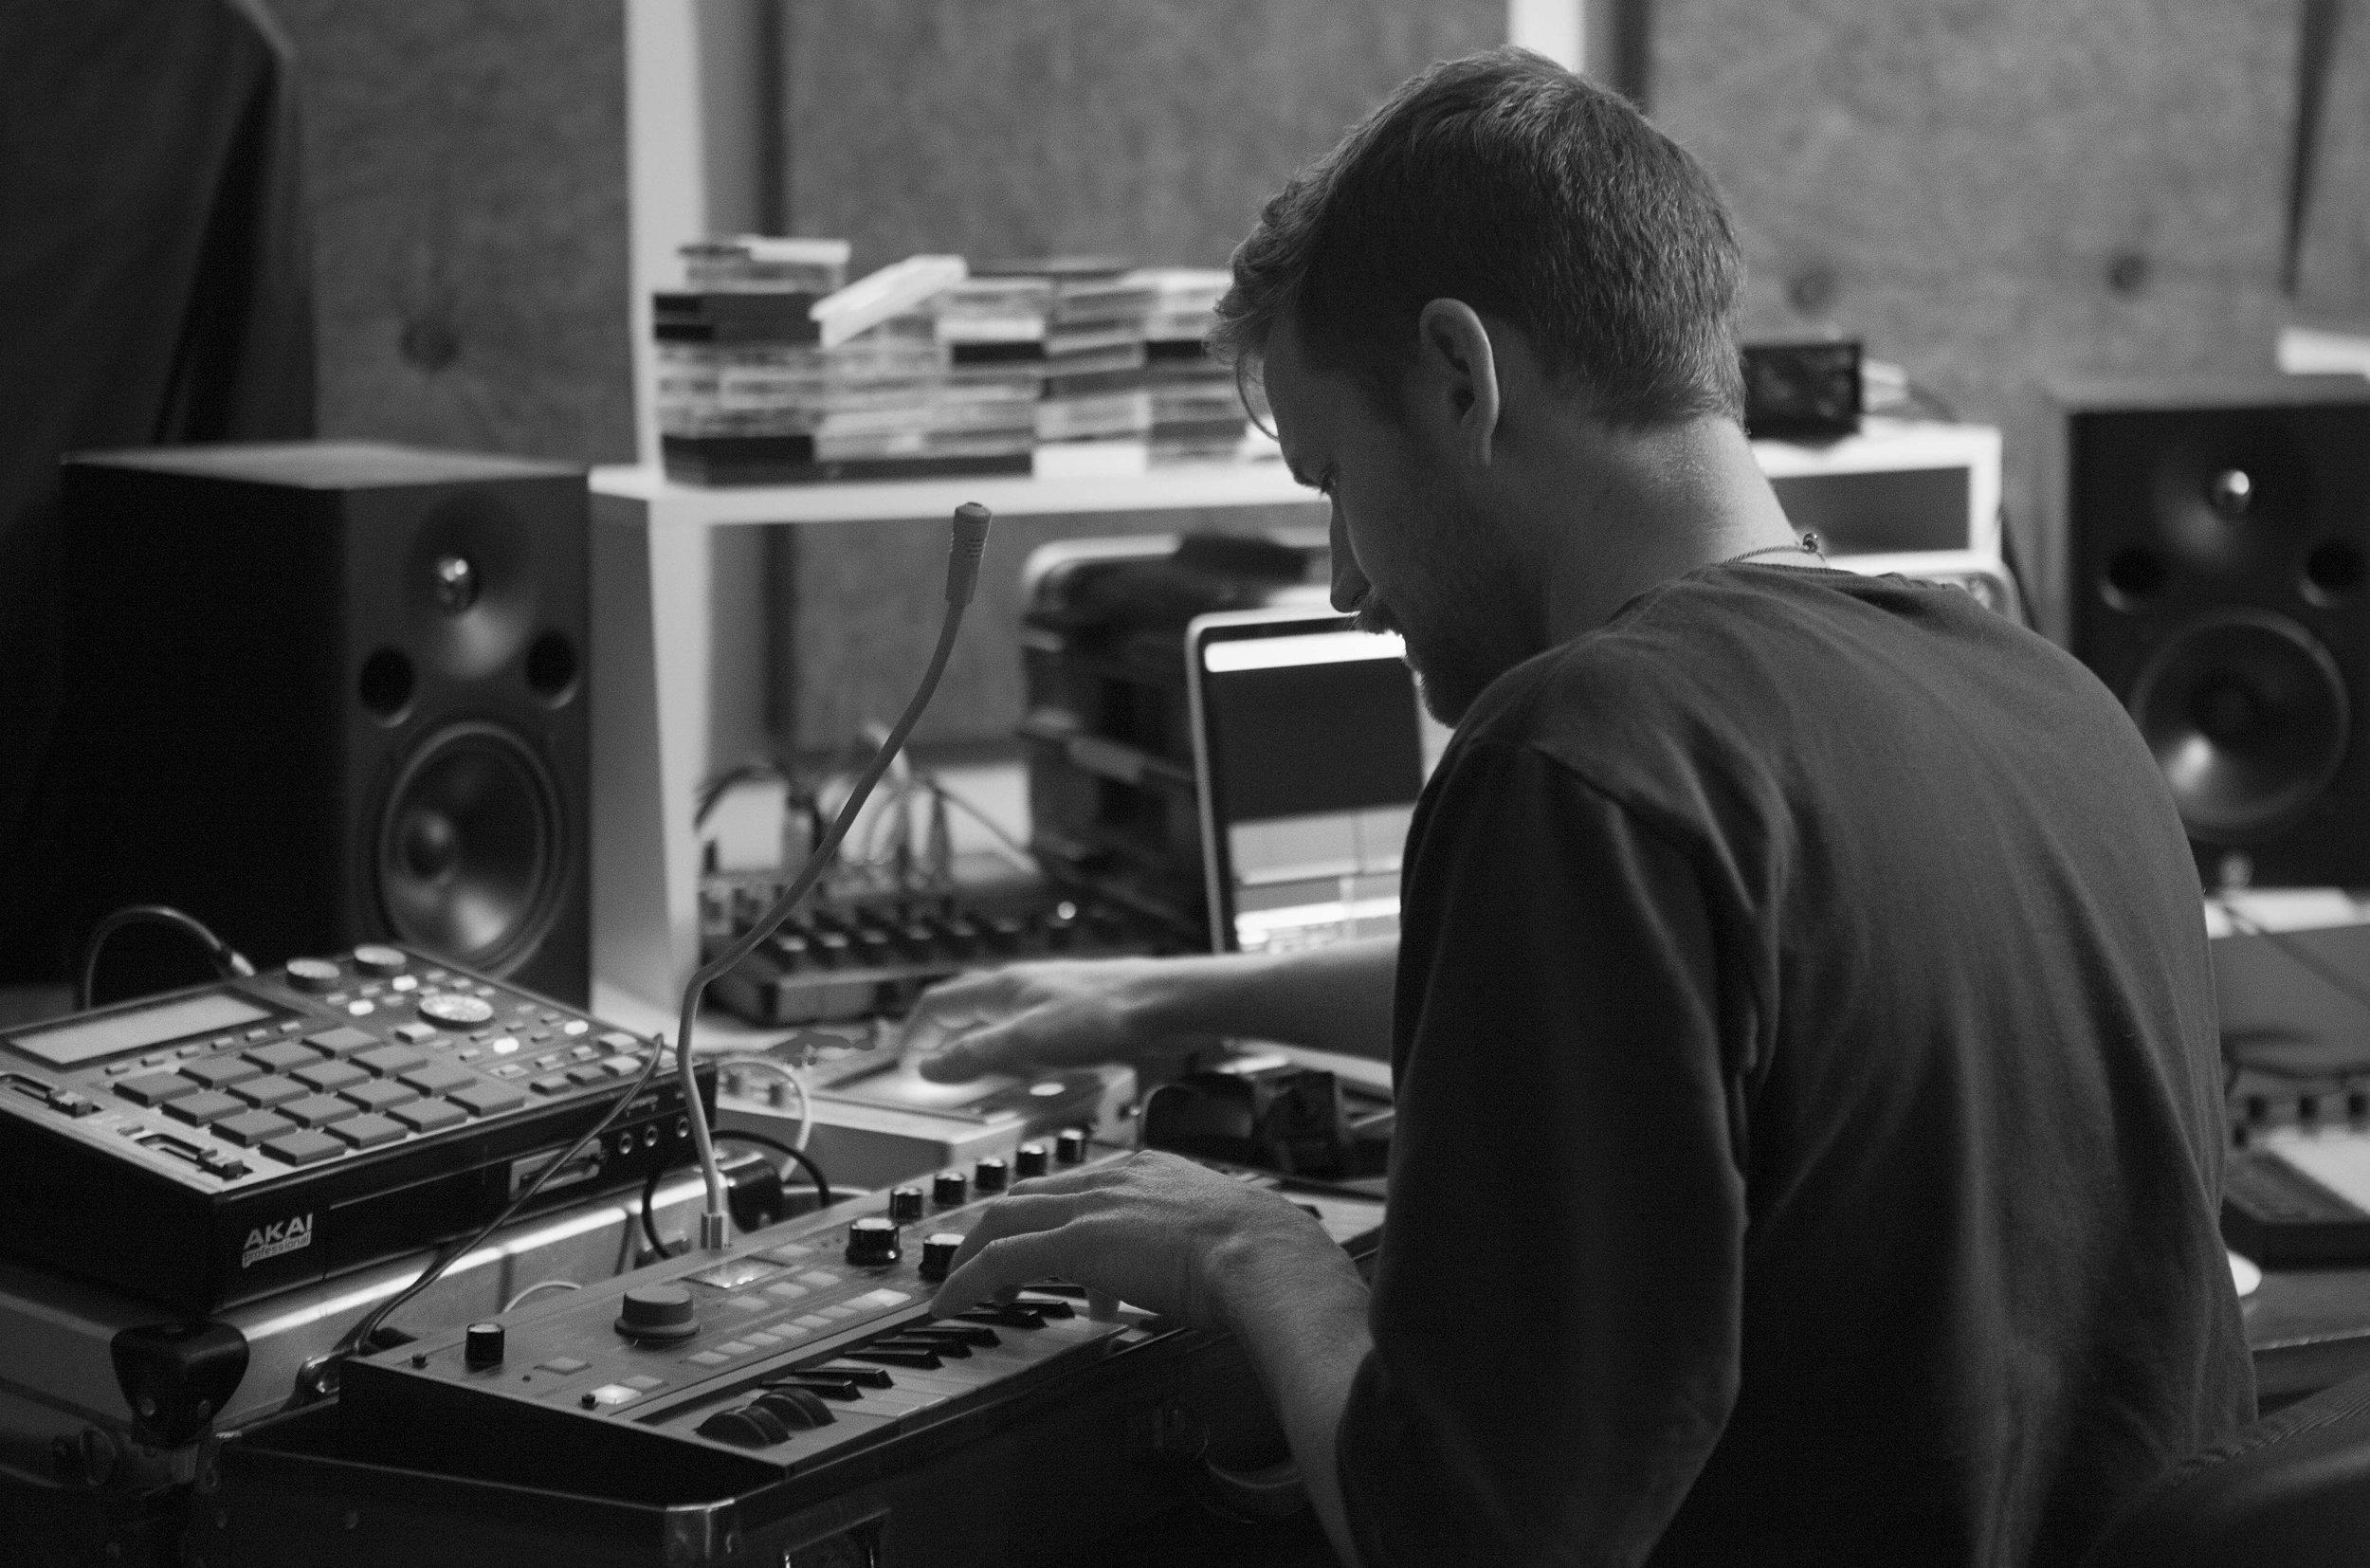 Tom working in the Barking Wolf studio in Fremantle.